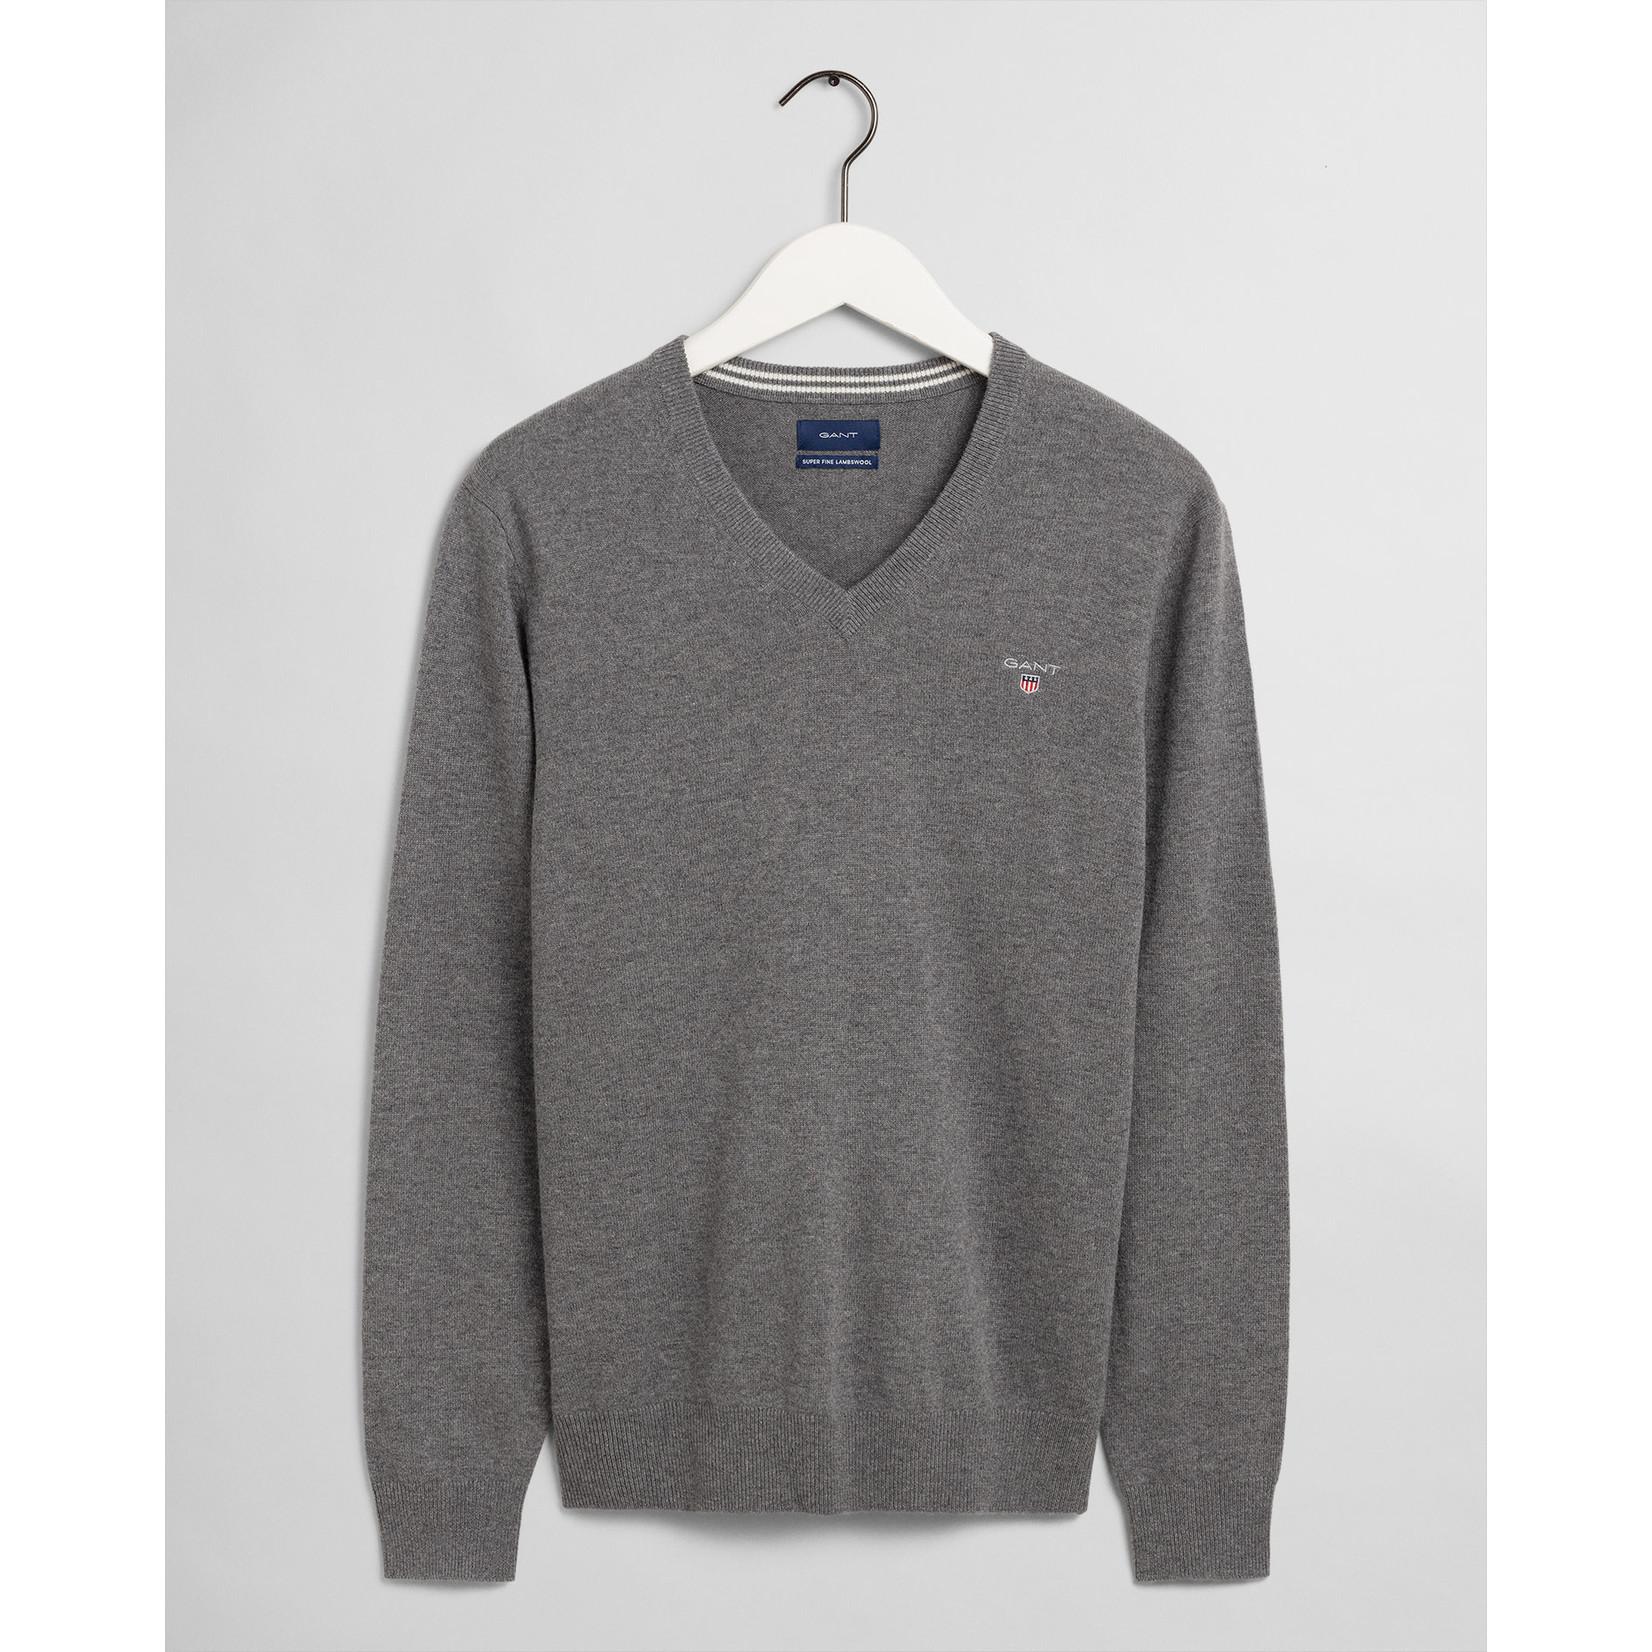 GANT pullover v-hals lamswol antraciet